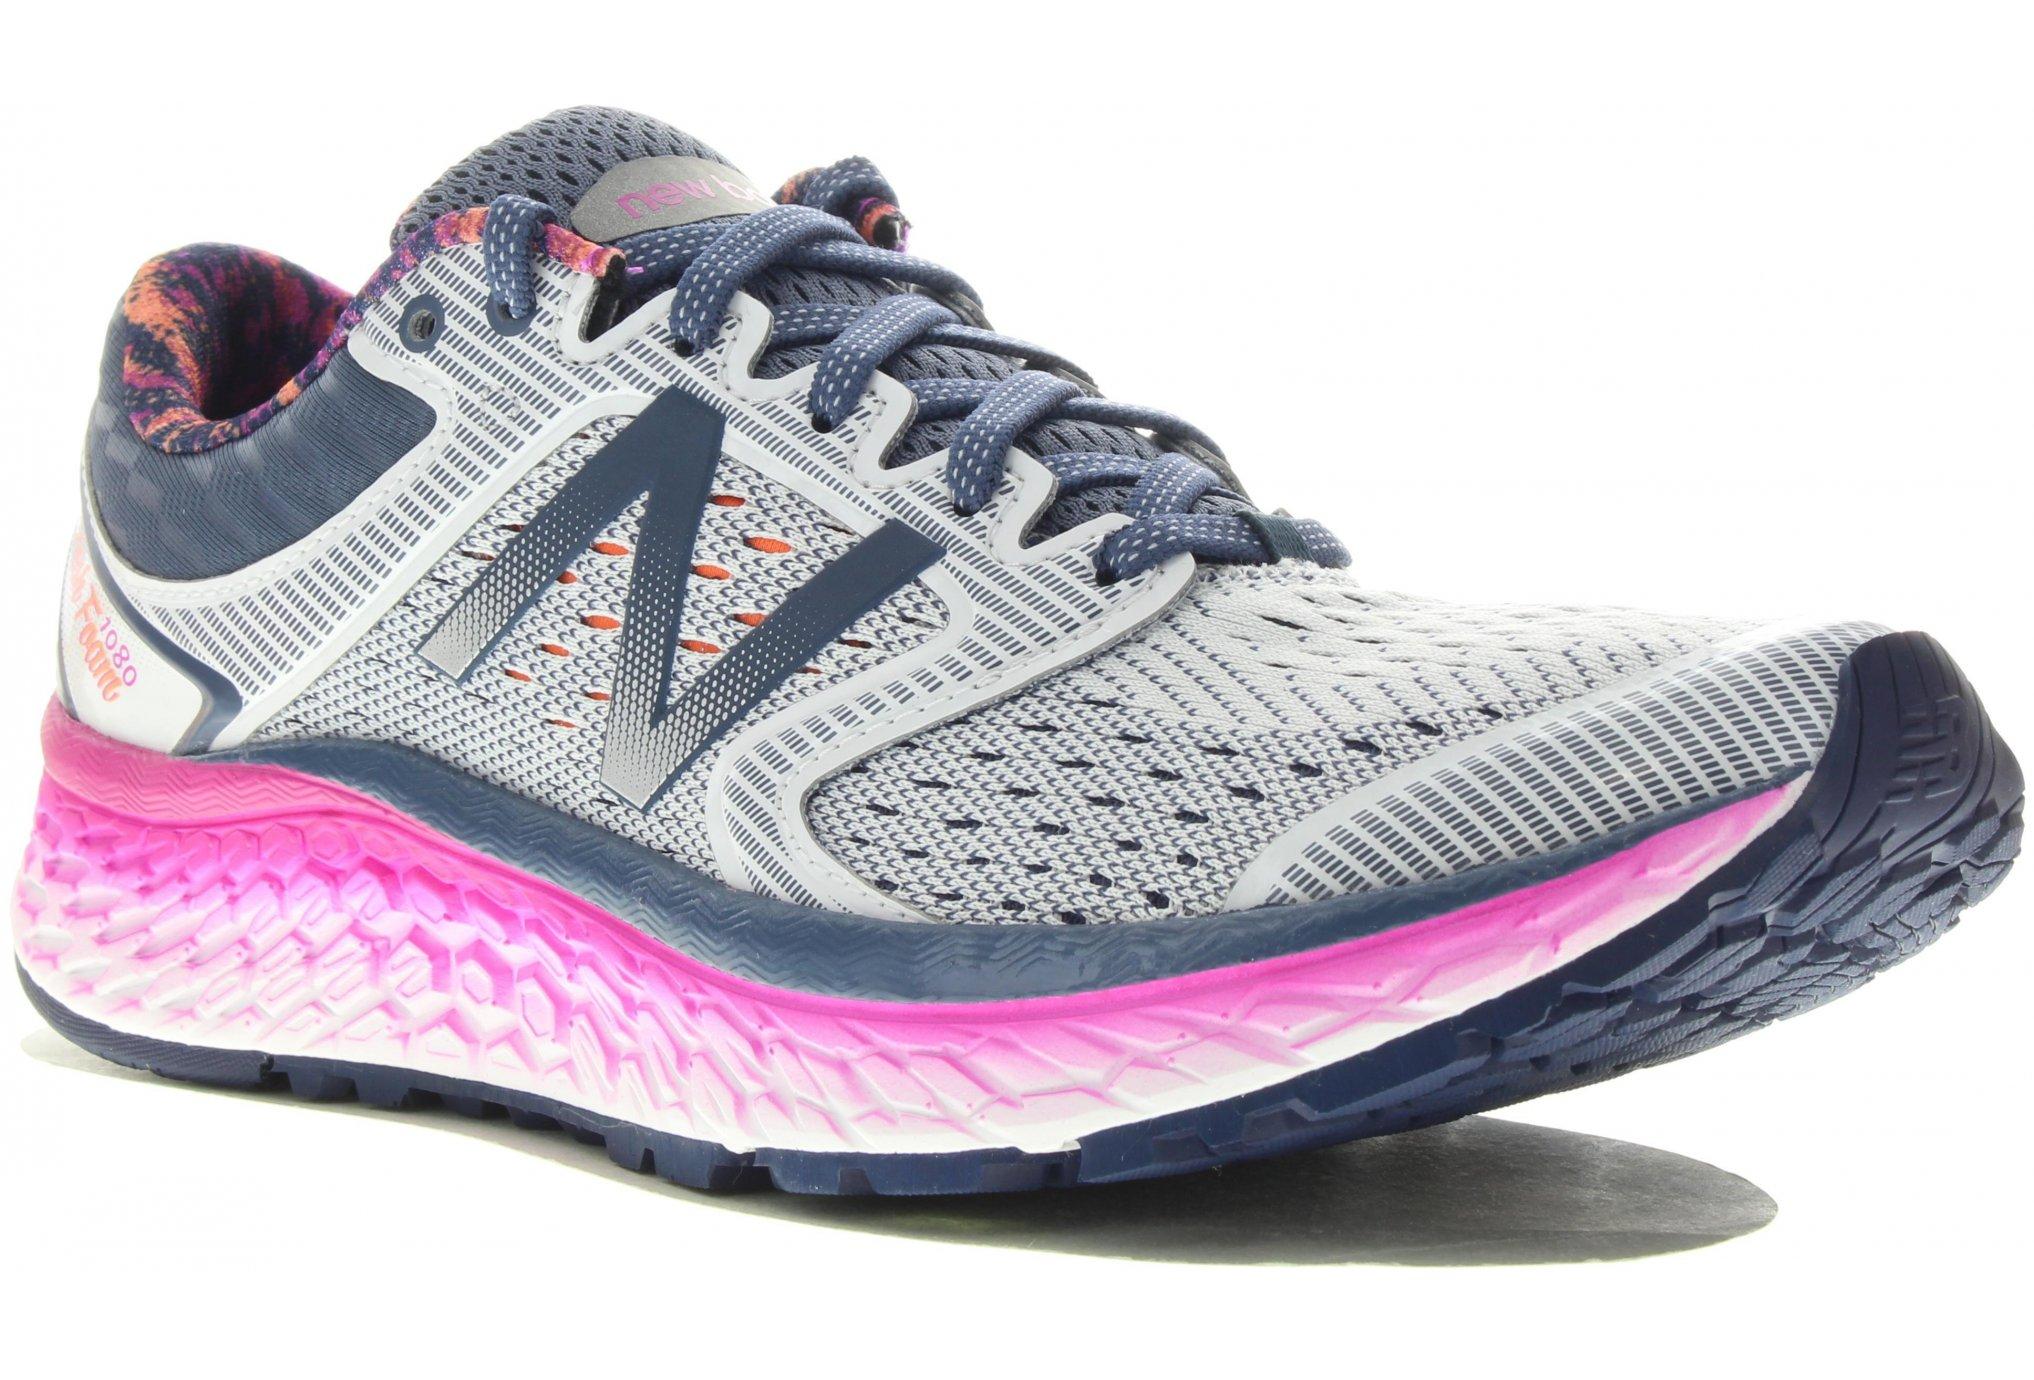 finest selection c7d8f 2098c New Balance Fresh Foam W 1080 V7 - B Chaussures running femme